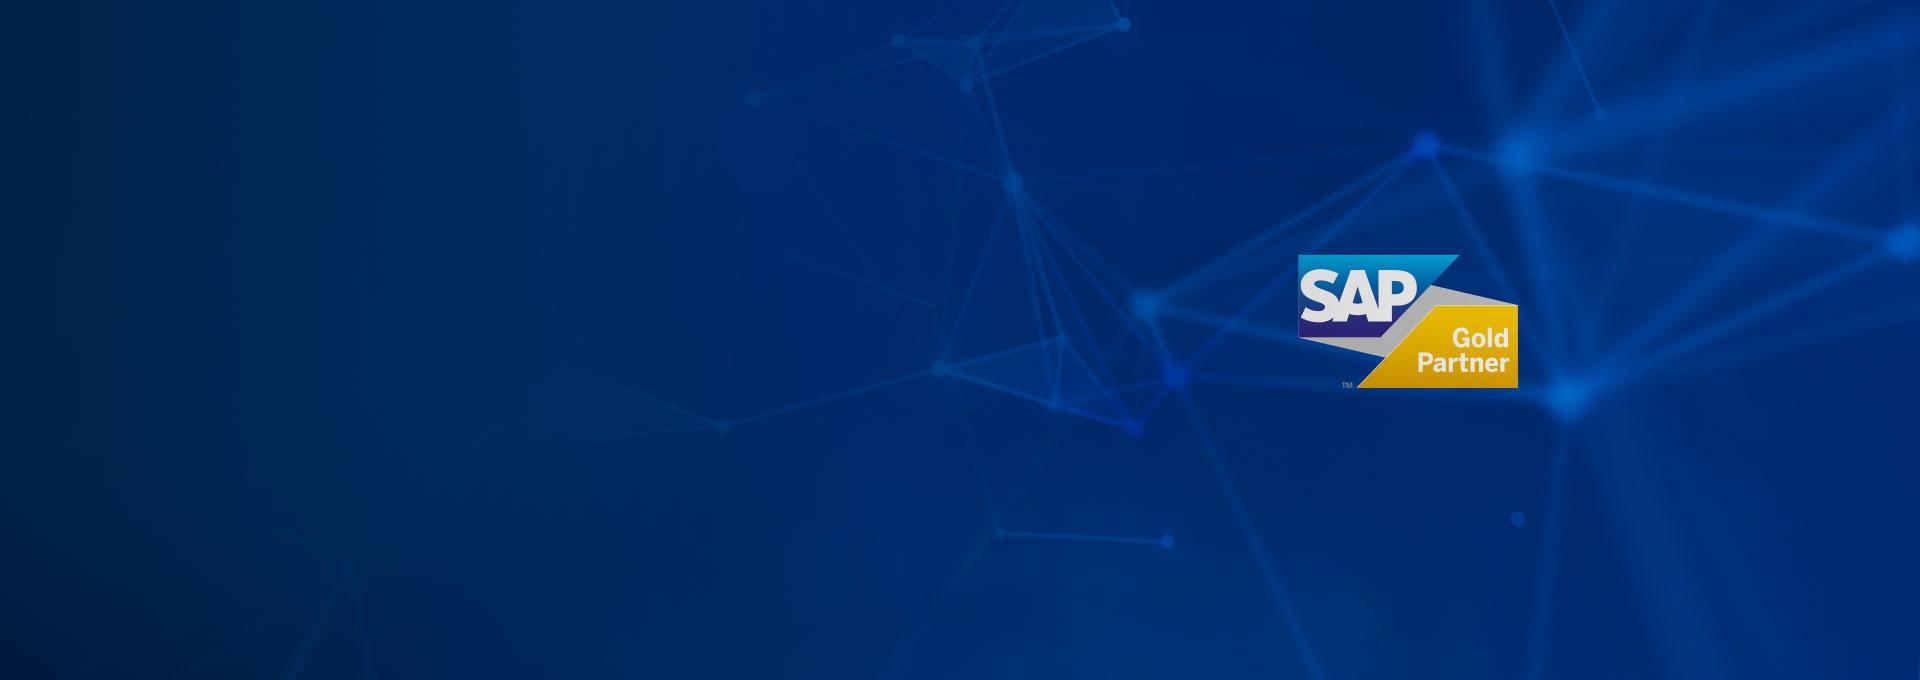 SAP-Marktführer